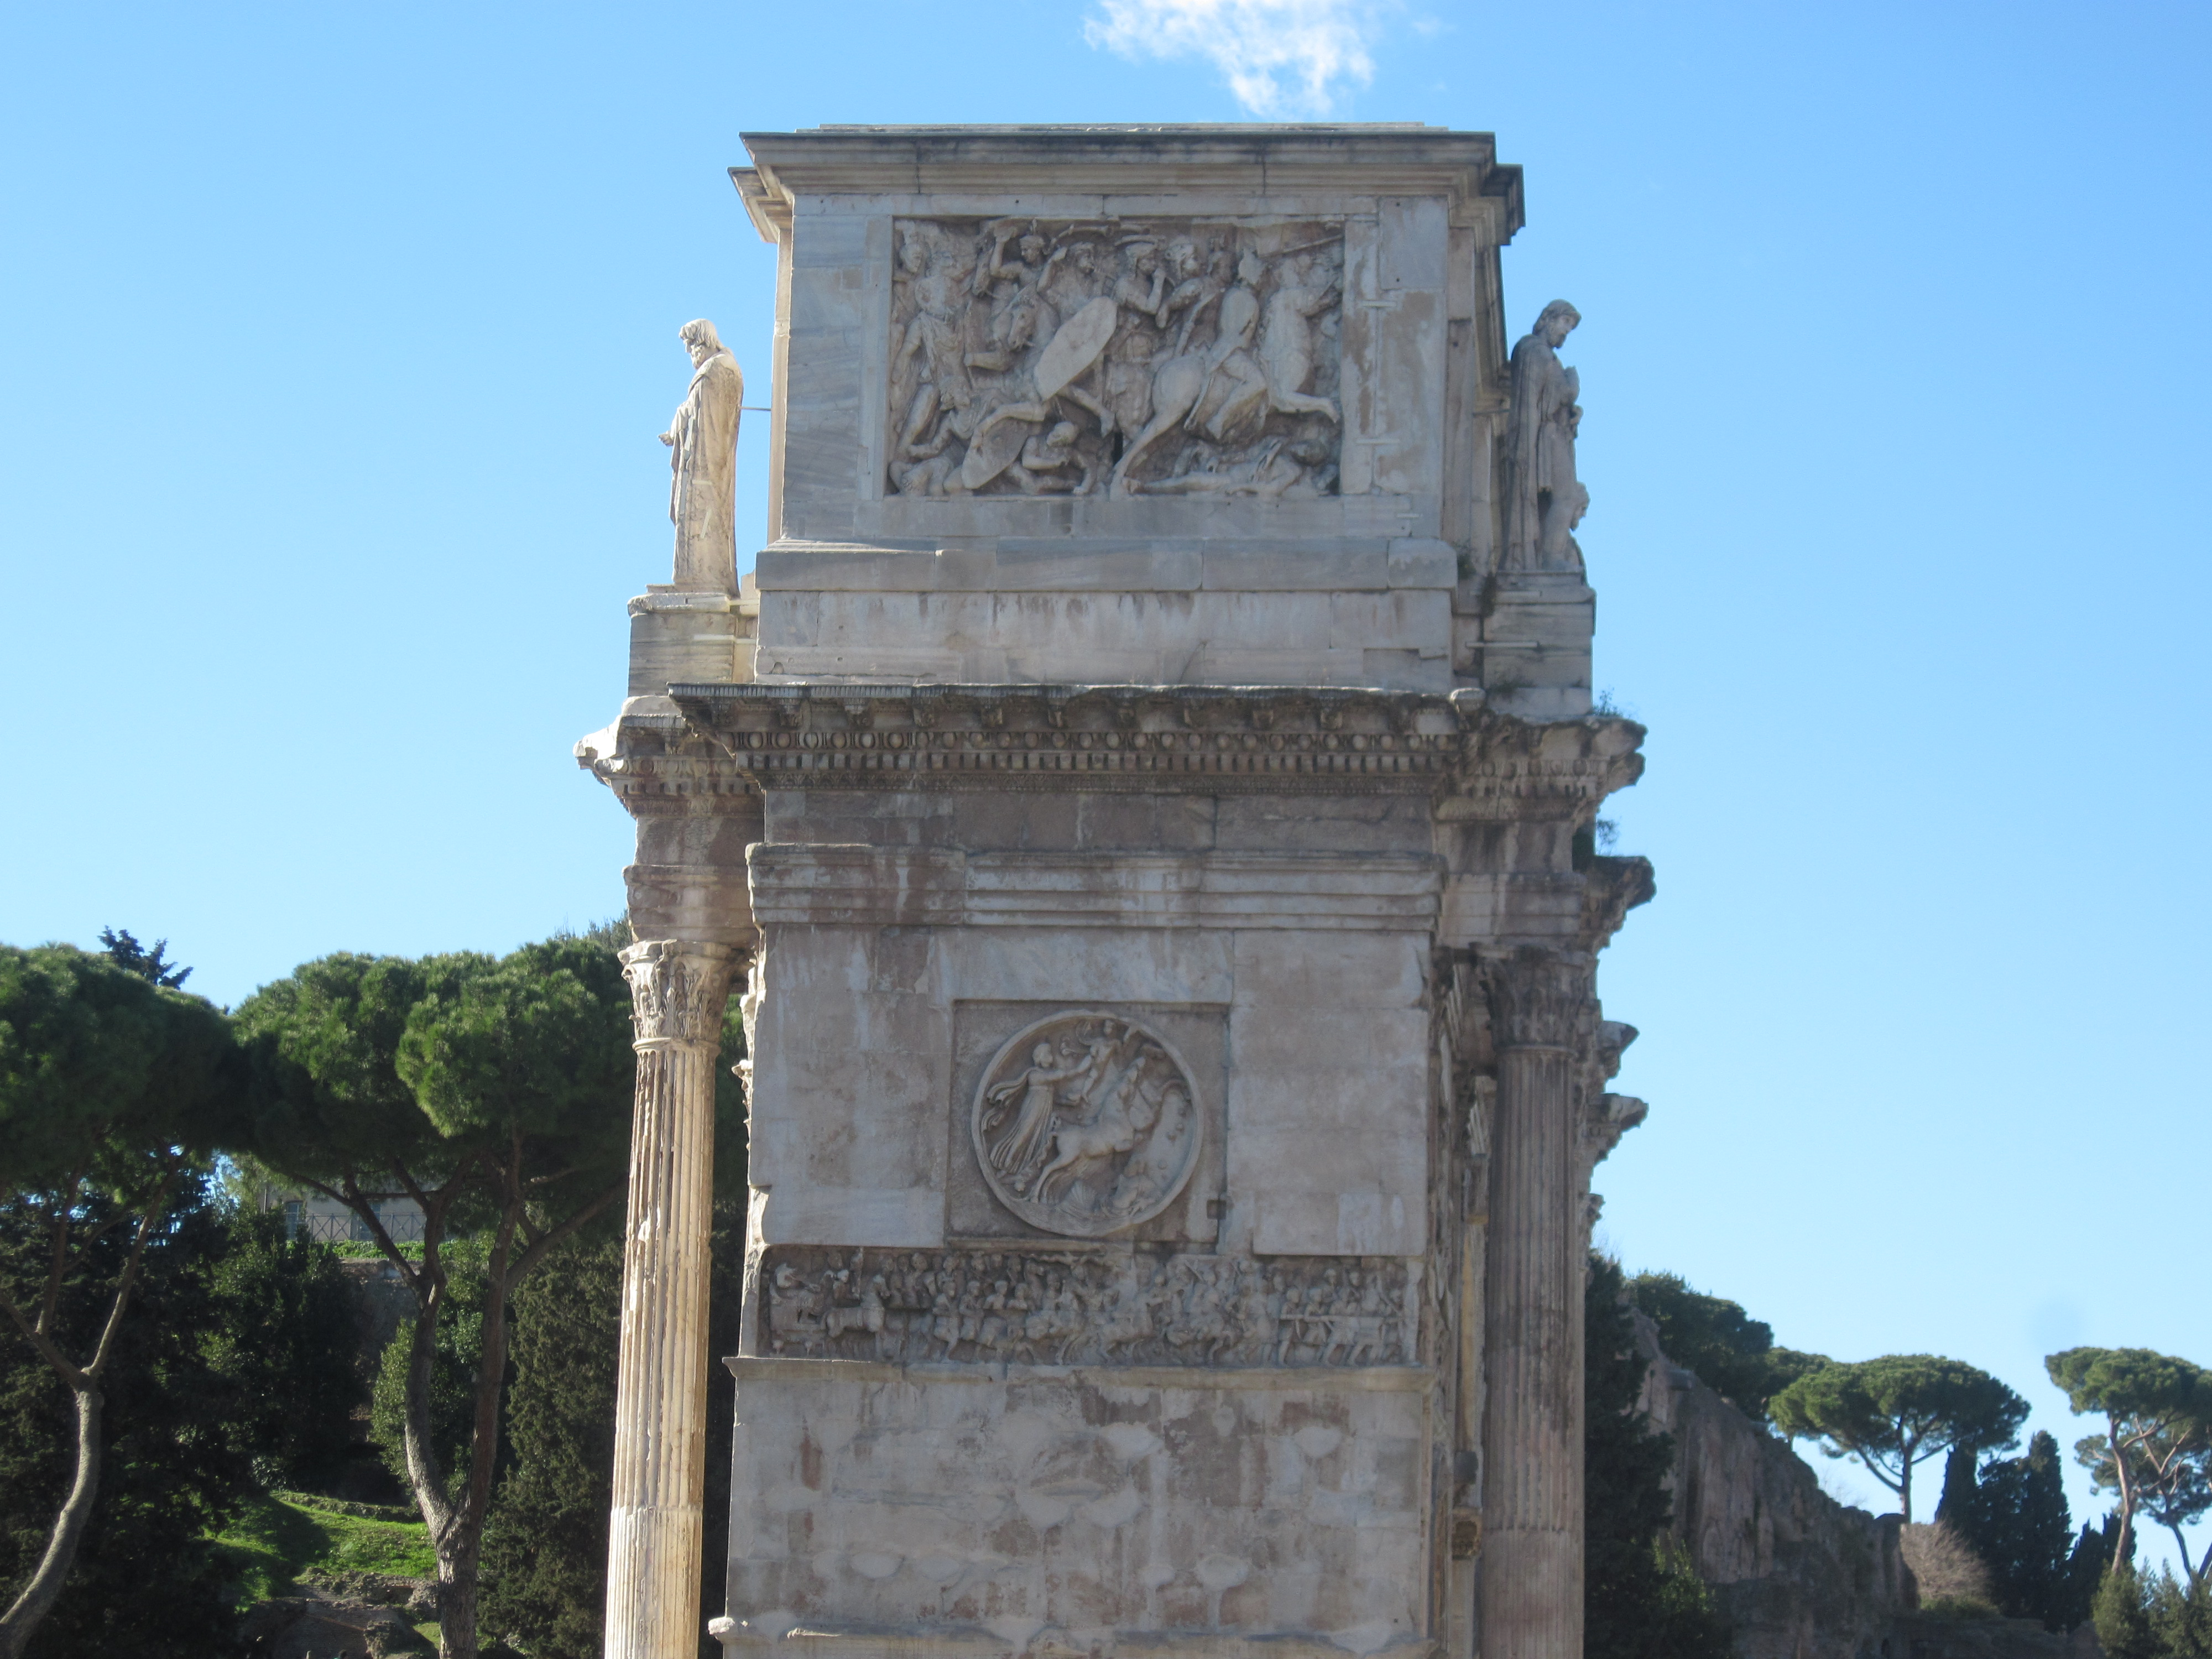 Monument of emperor constantin, rome photo